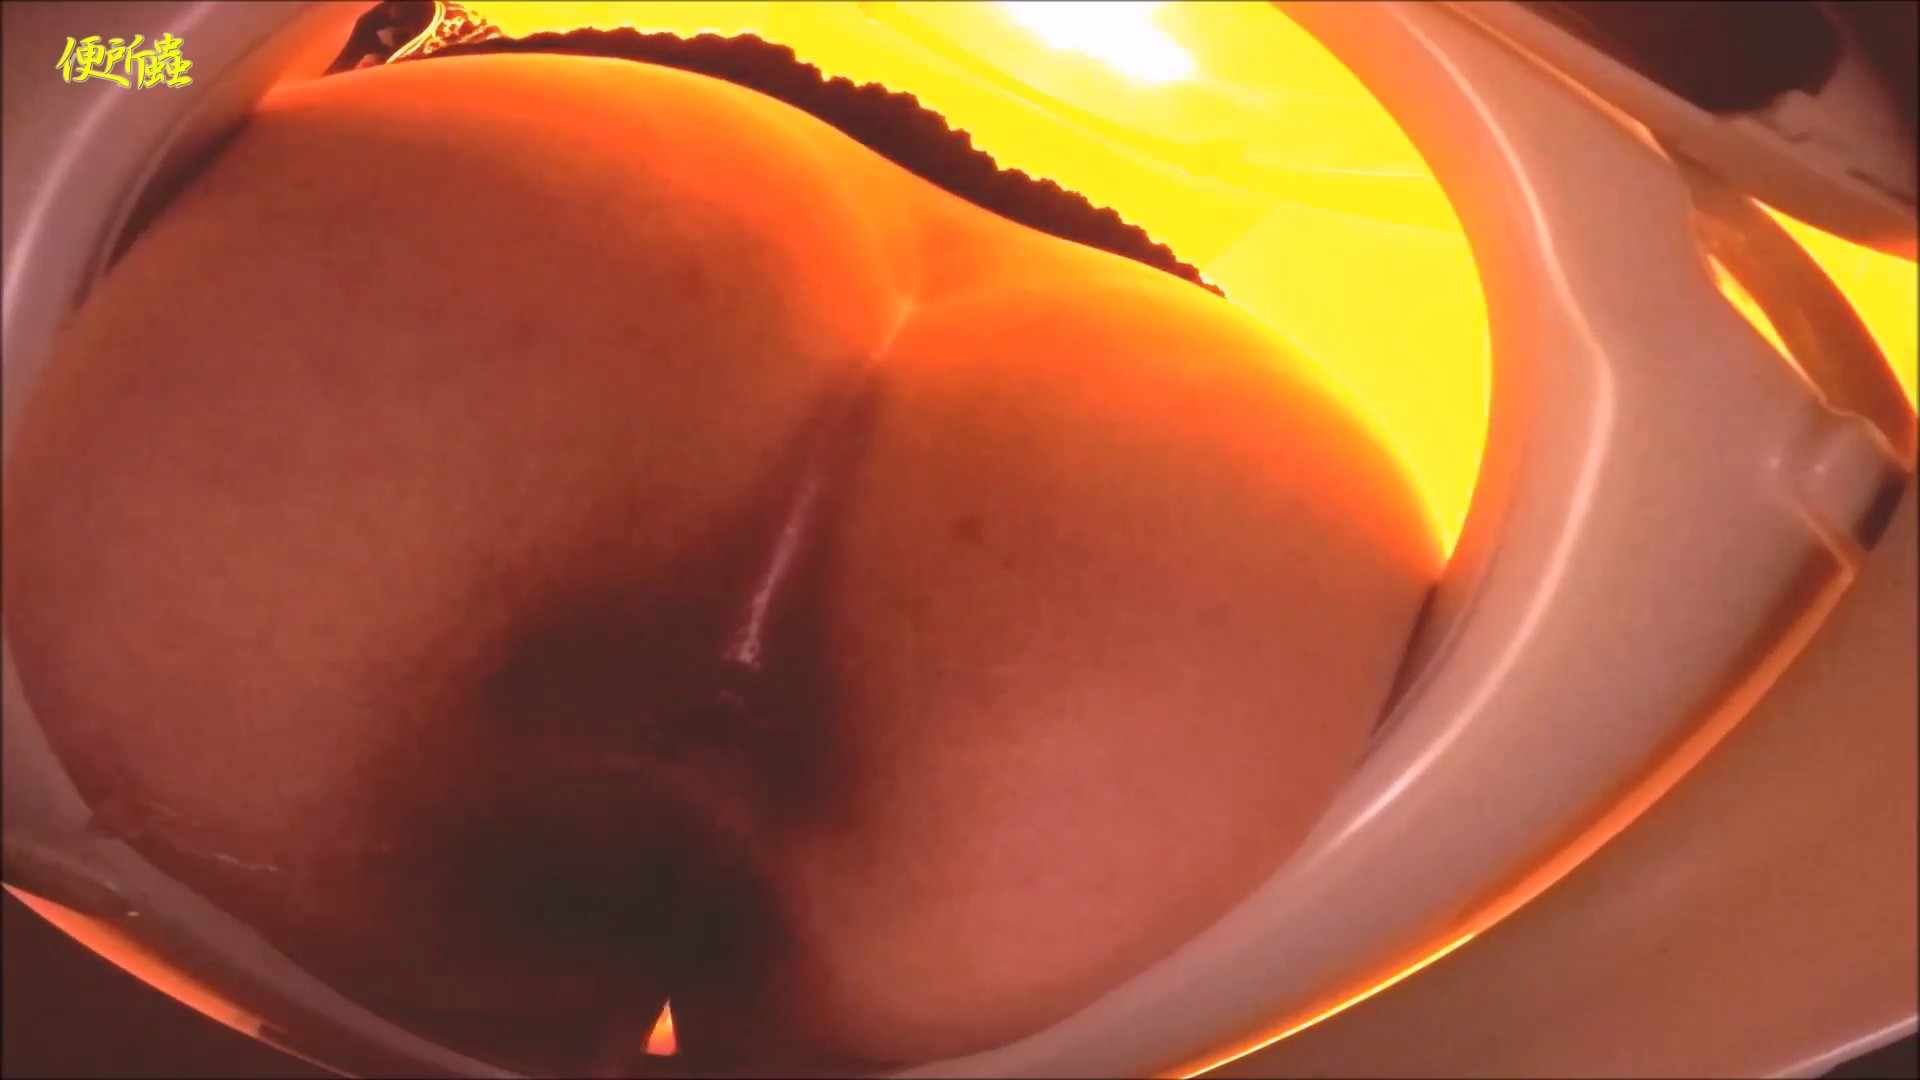 vol.08 便所蟲さんのリターン~寺子屋洗面所盗撮~ 盛合せ ヌード画像 94画像 27